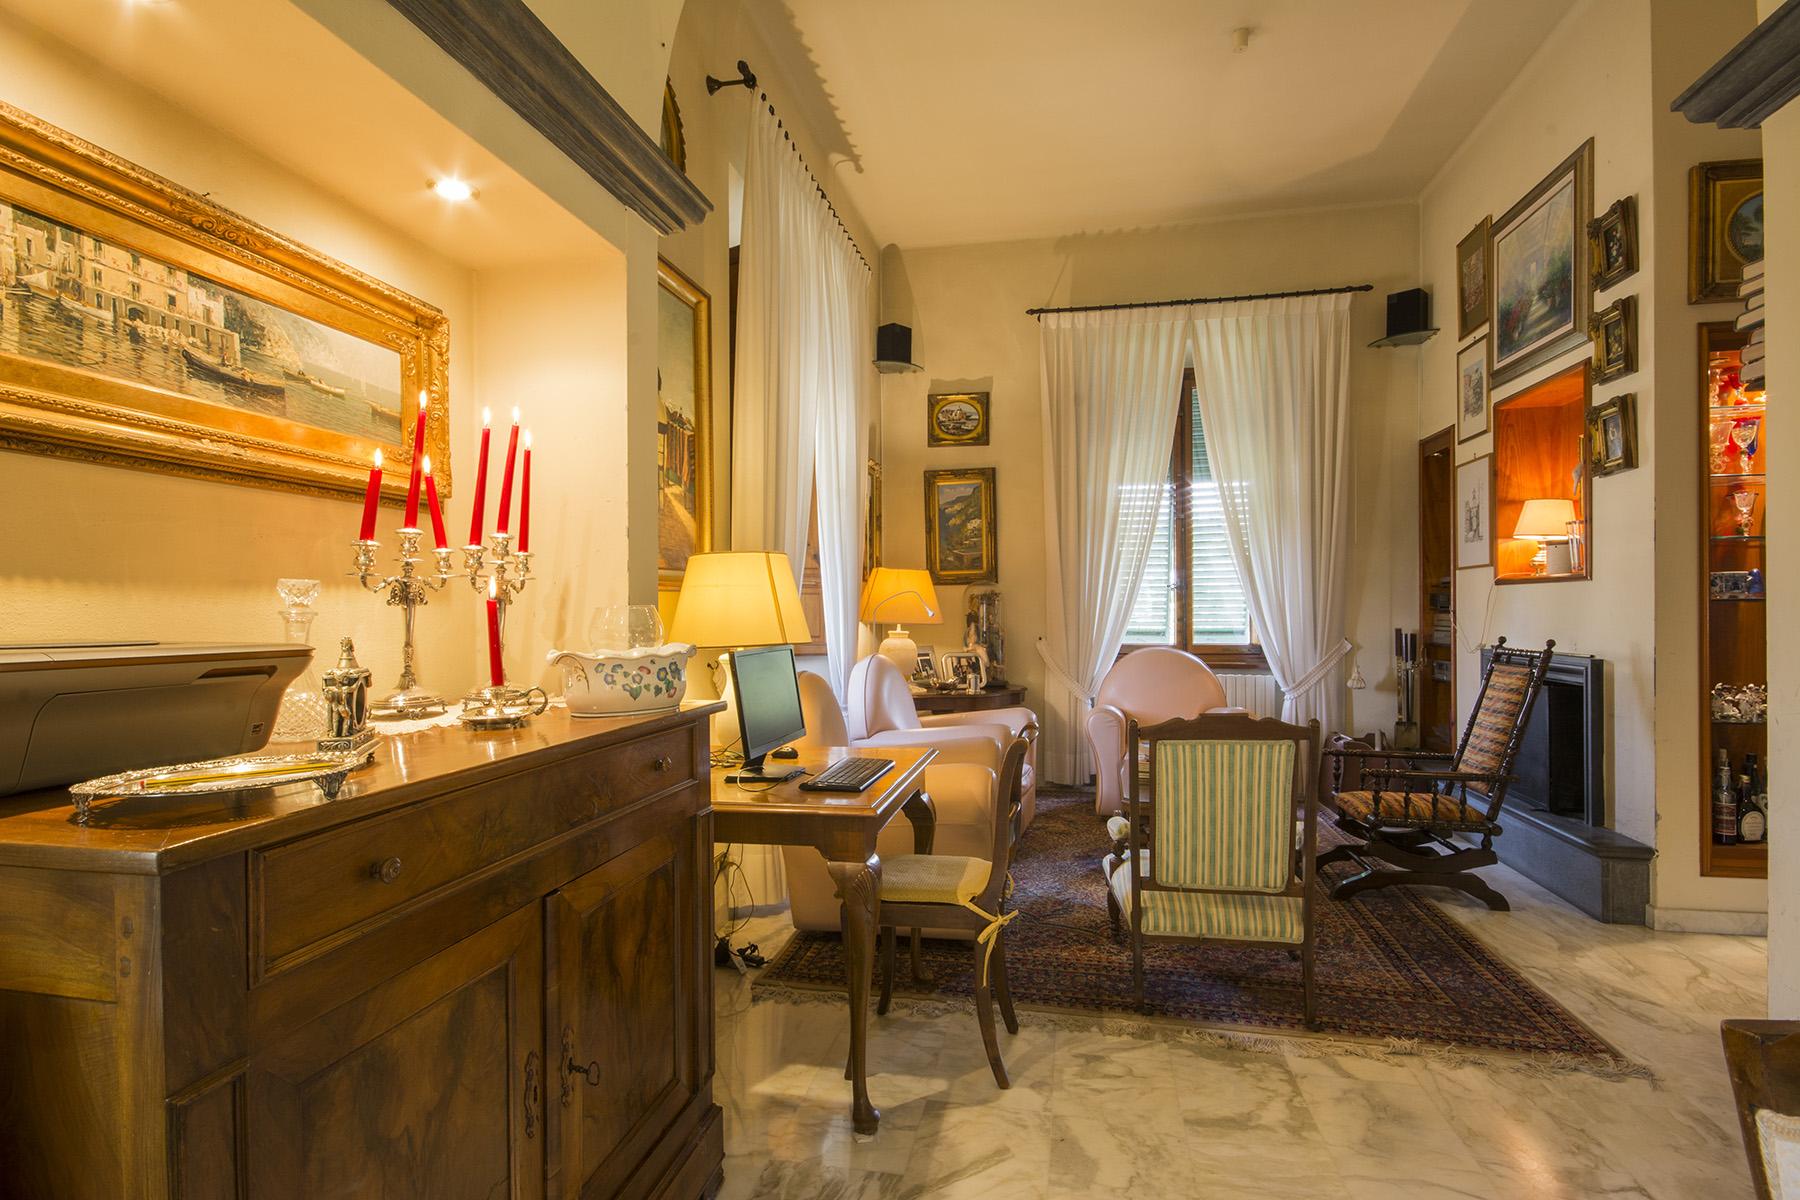 Villa in Vendita a Lucca: 5 locali, 500 mq - Foto 5